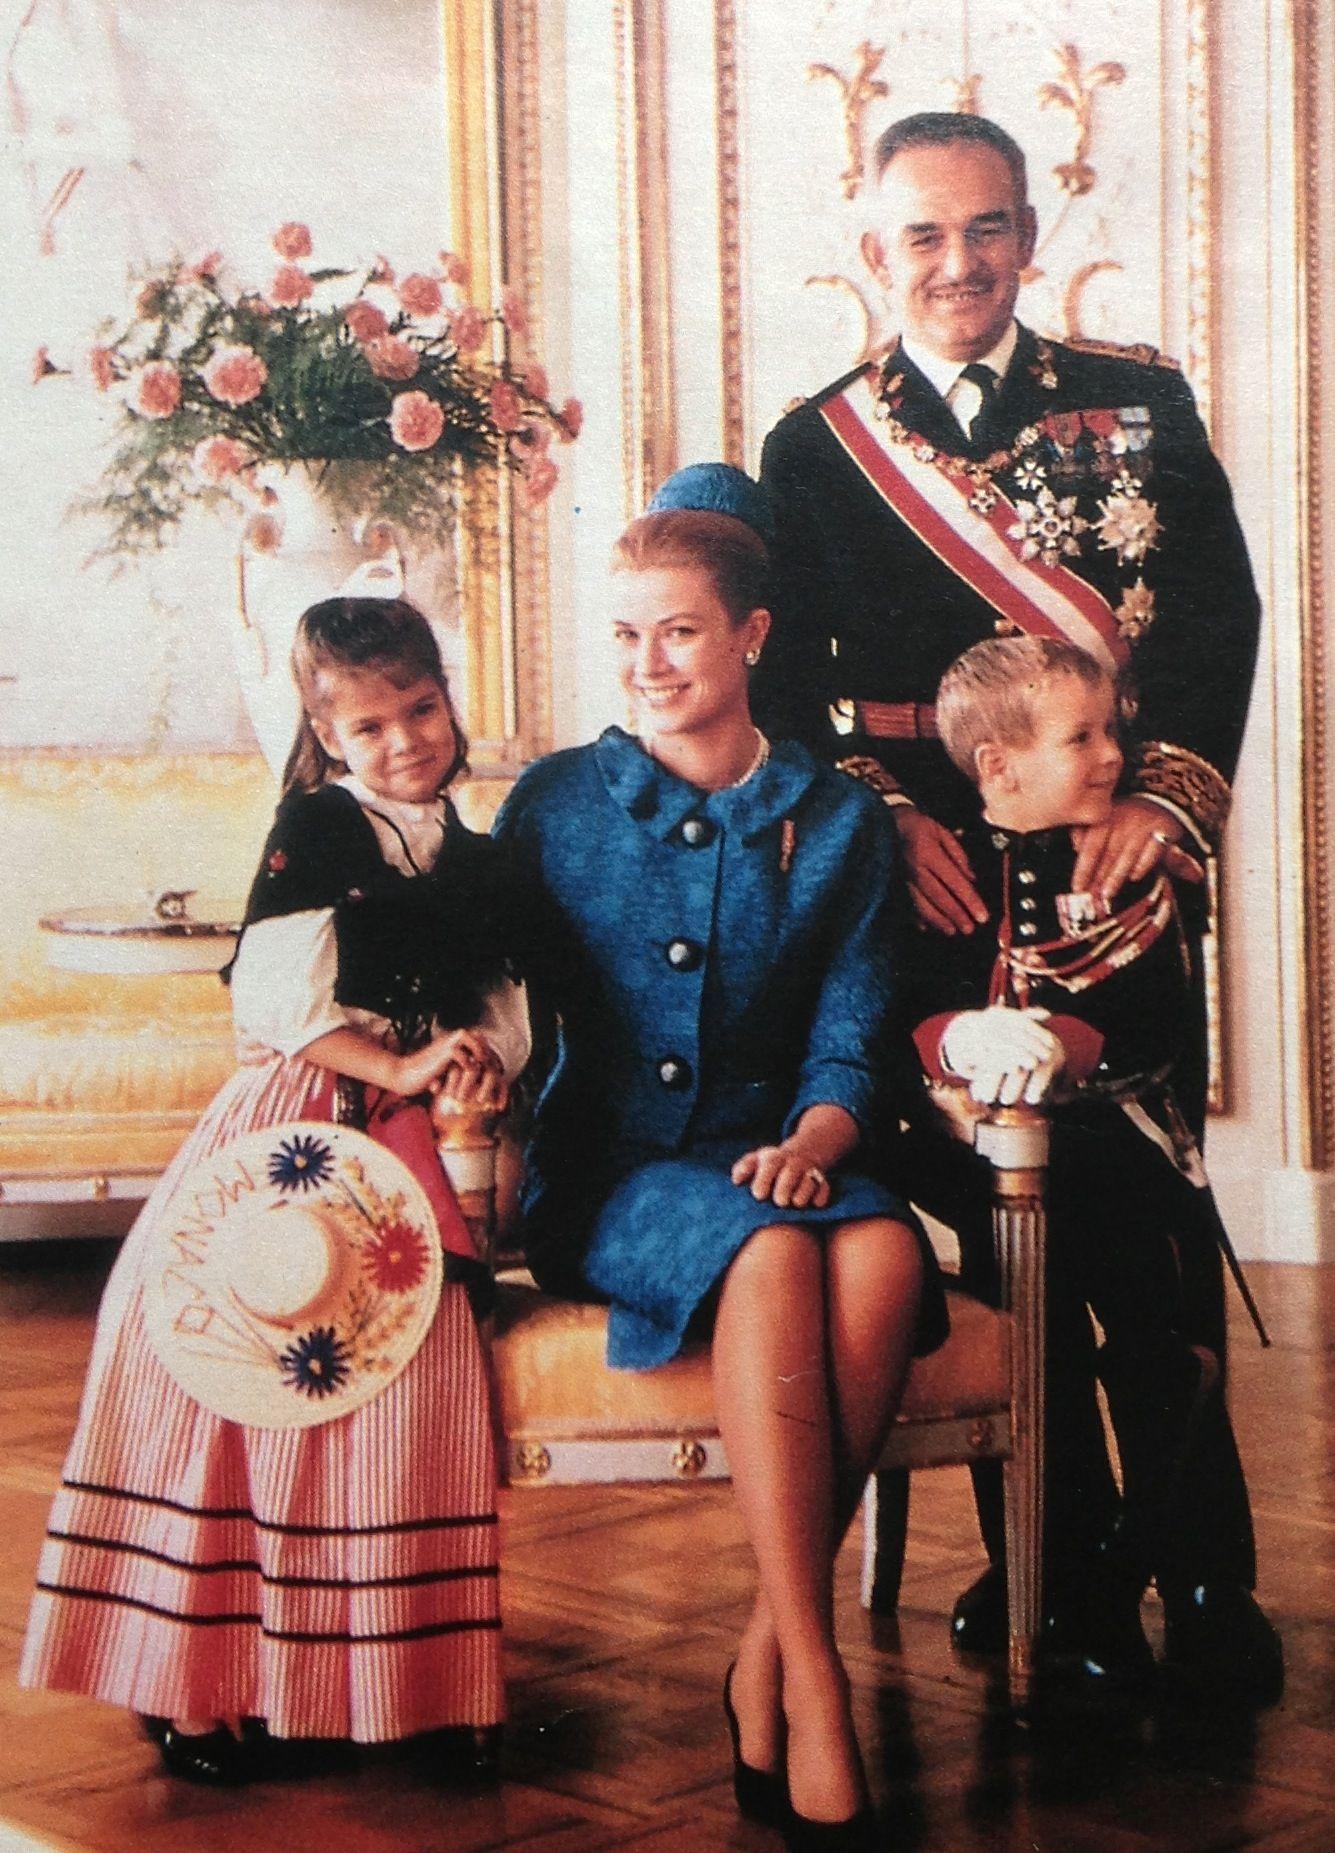 Monaco royal family 1963 Princess grace kelly, Grace